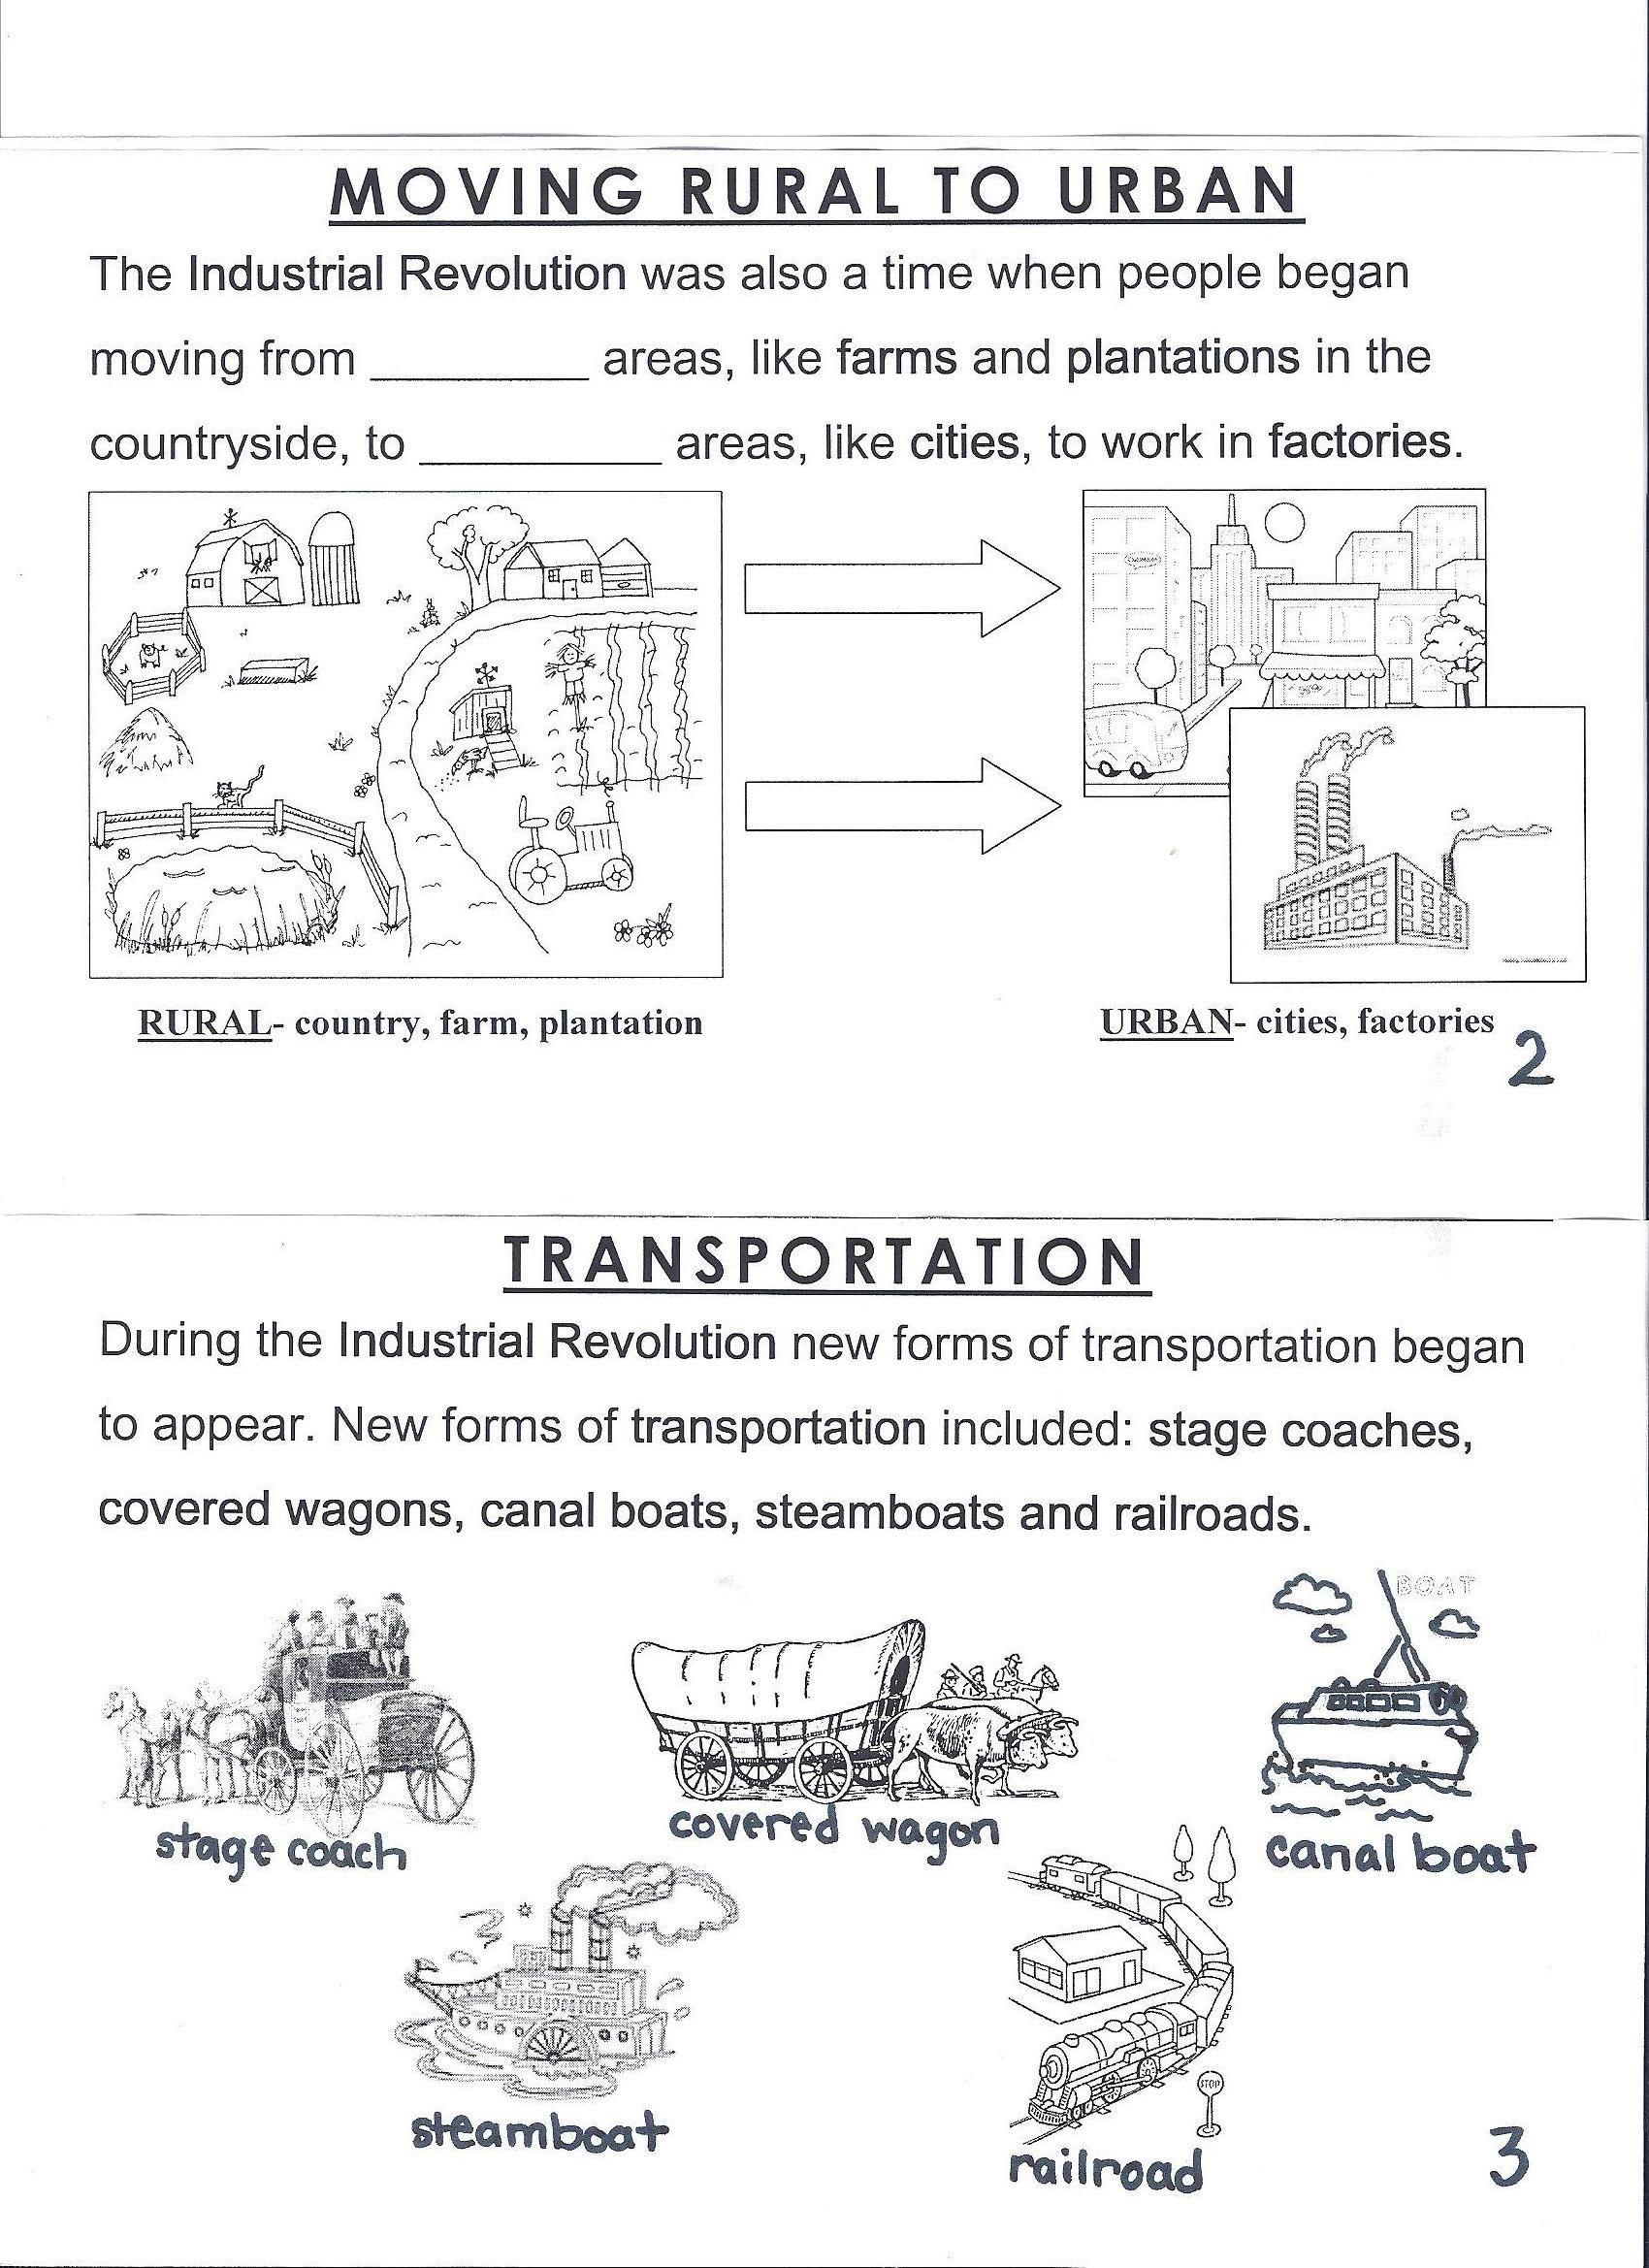 Industrial+Revolution+2.jpg 1 [ 2338 x 1700 Pixel ]